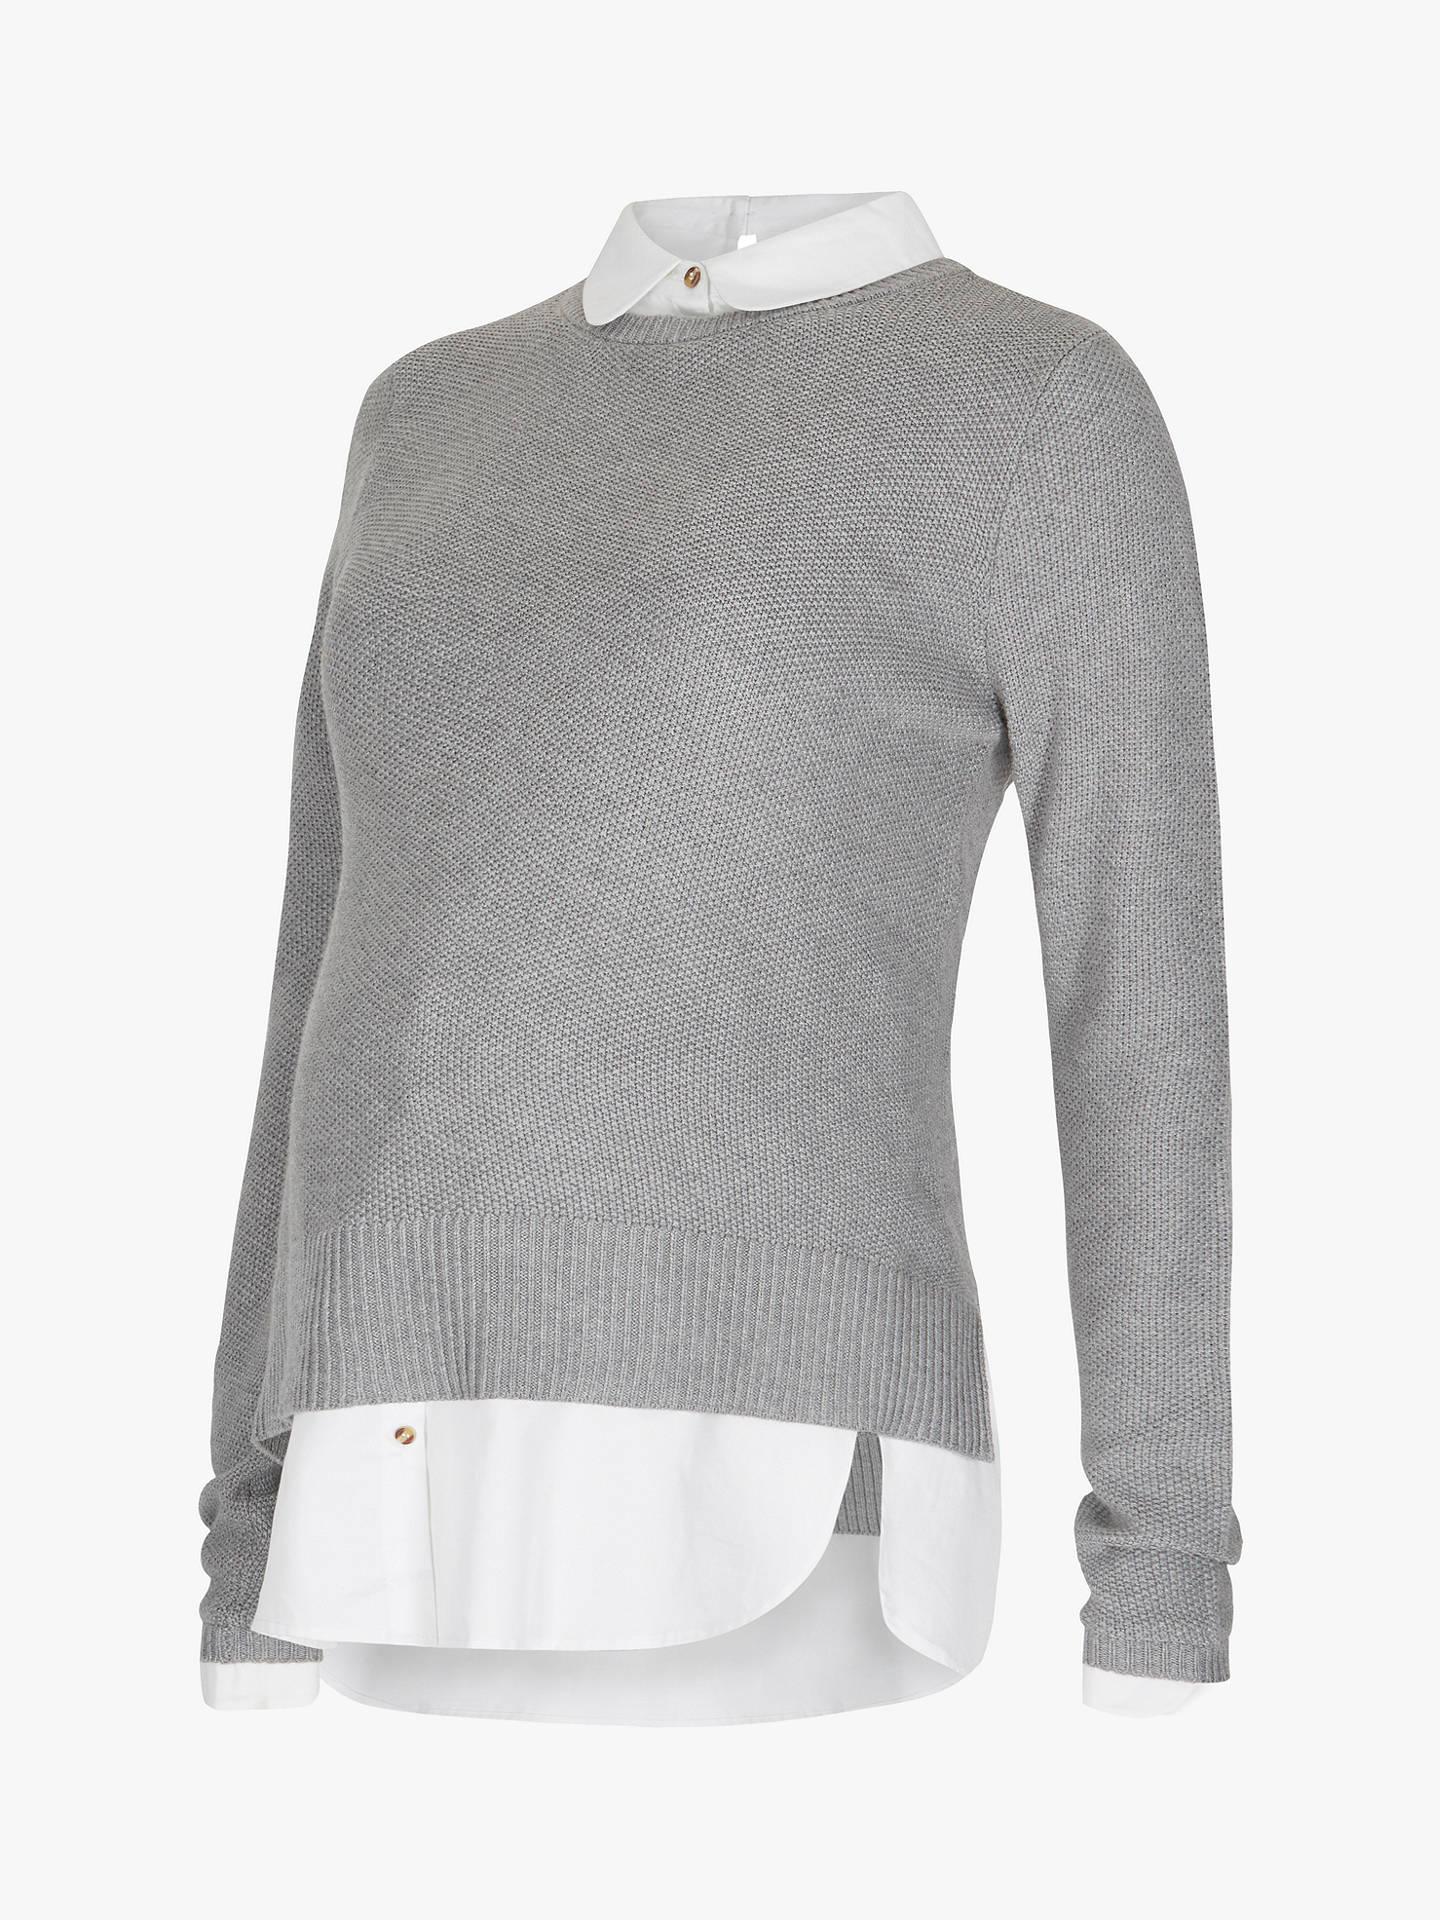 BuySéraphine Marianne Nursing Shirt Jumper 63ad3dcf4